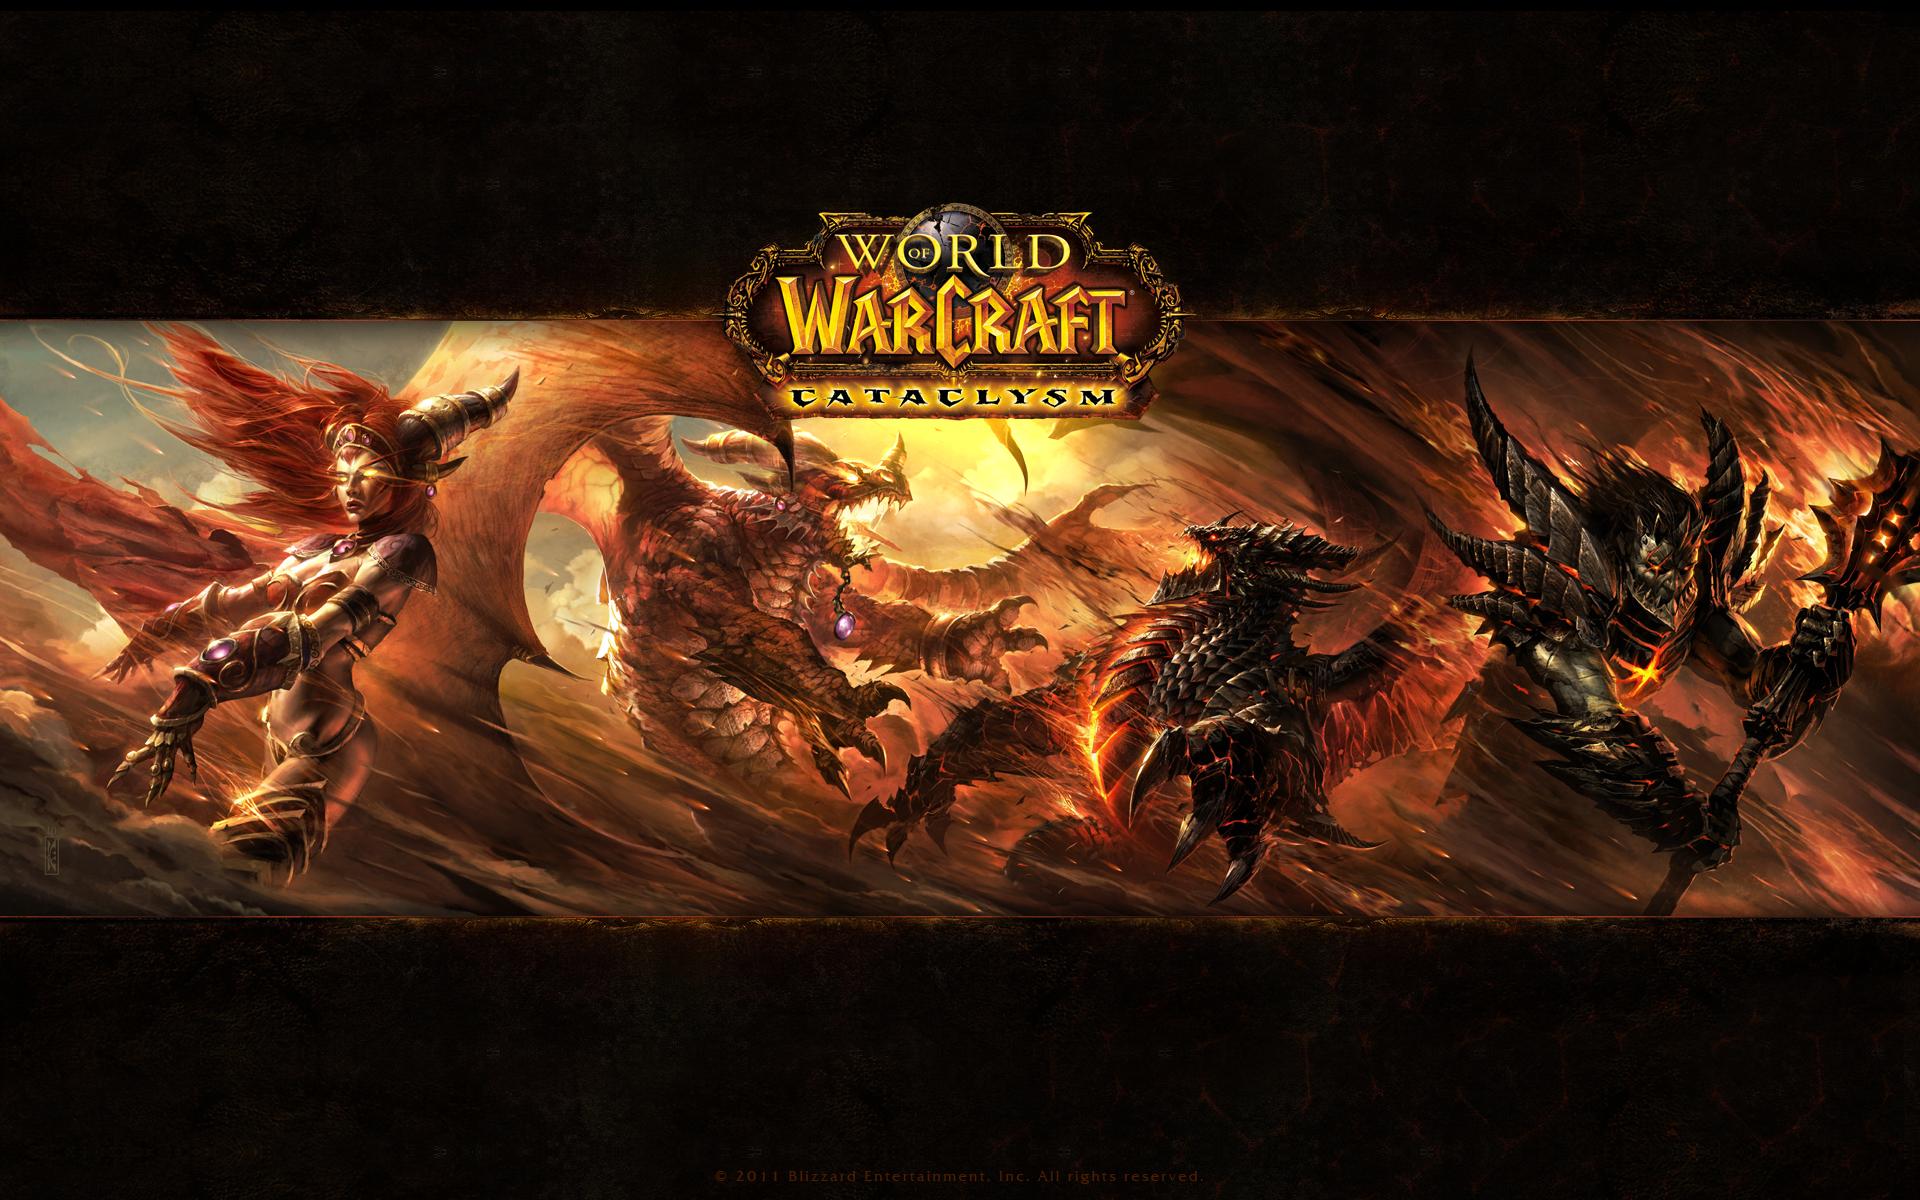 World of Warcraft wallpaper 5